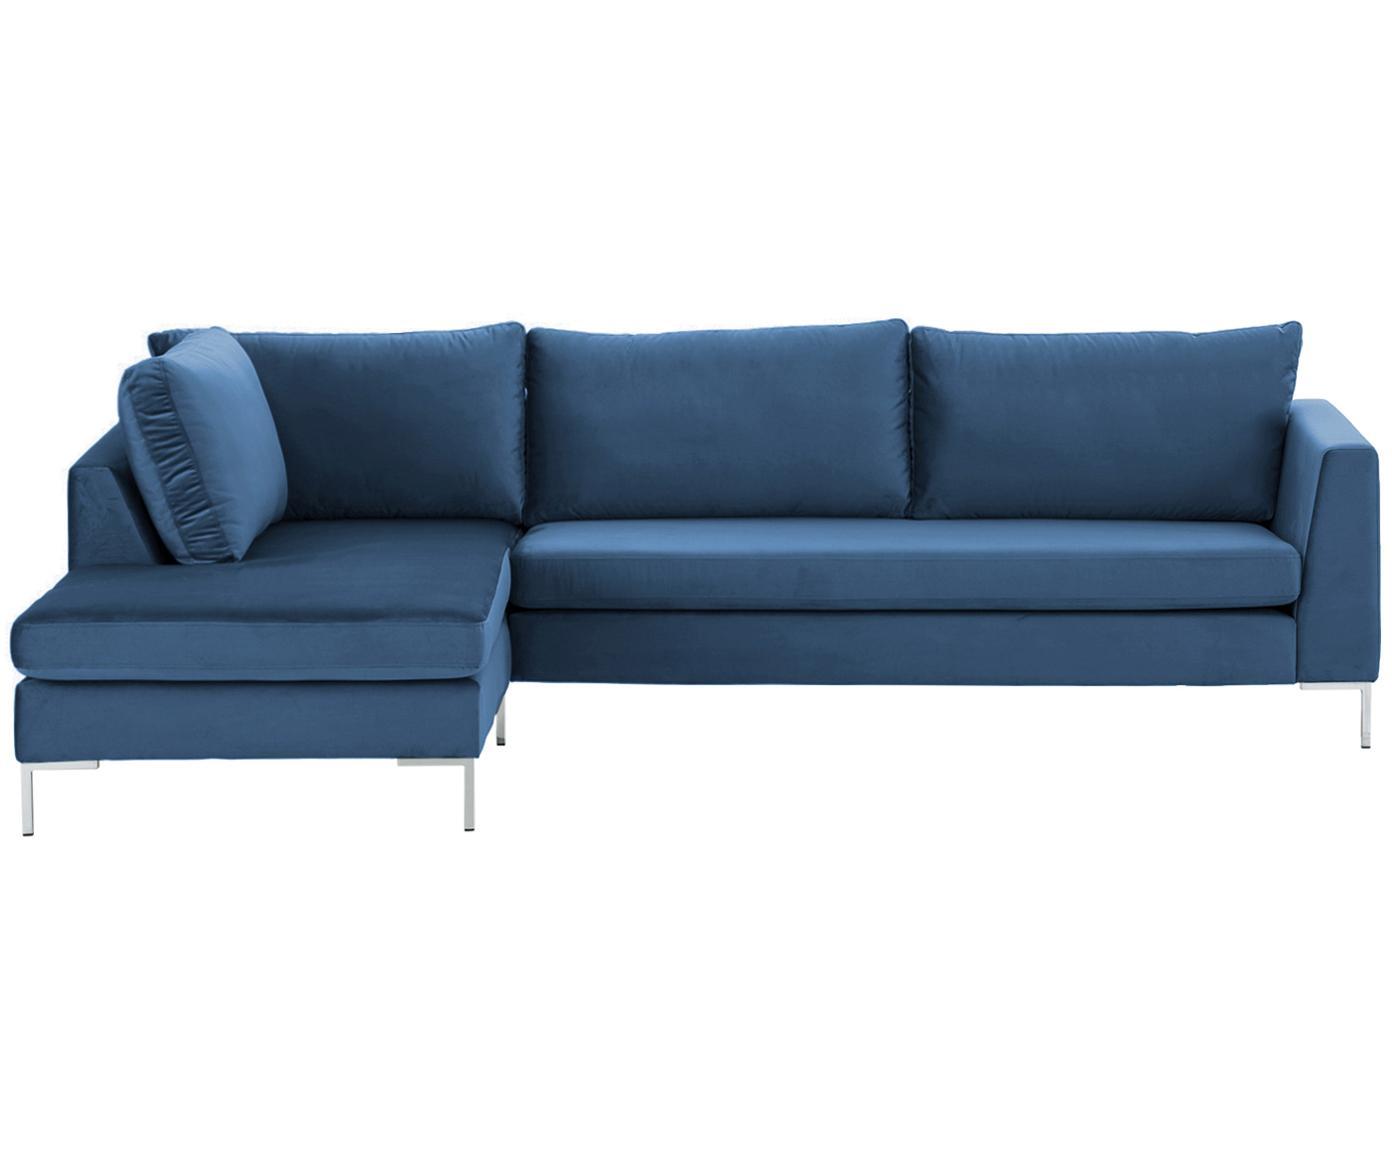 Samt-Ecksofa Luna, Bezug: Samt (Polyester) 80.000 S, Gestell: Massives Buchenholz, Füße: Metall, galvanisiert, Samt Blau, Silber, B 280 x T 184 cm